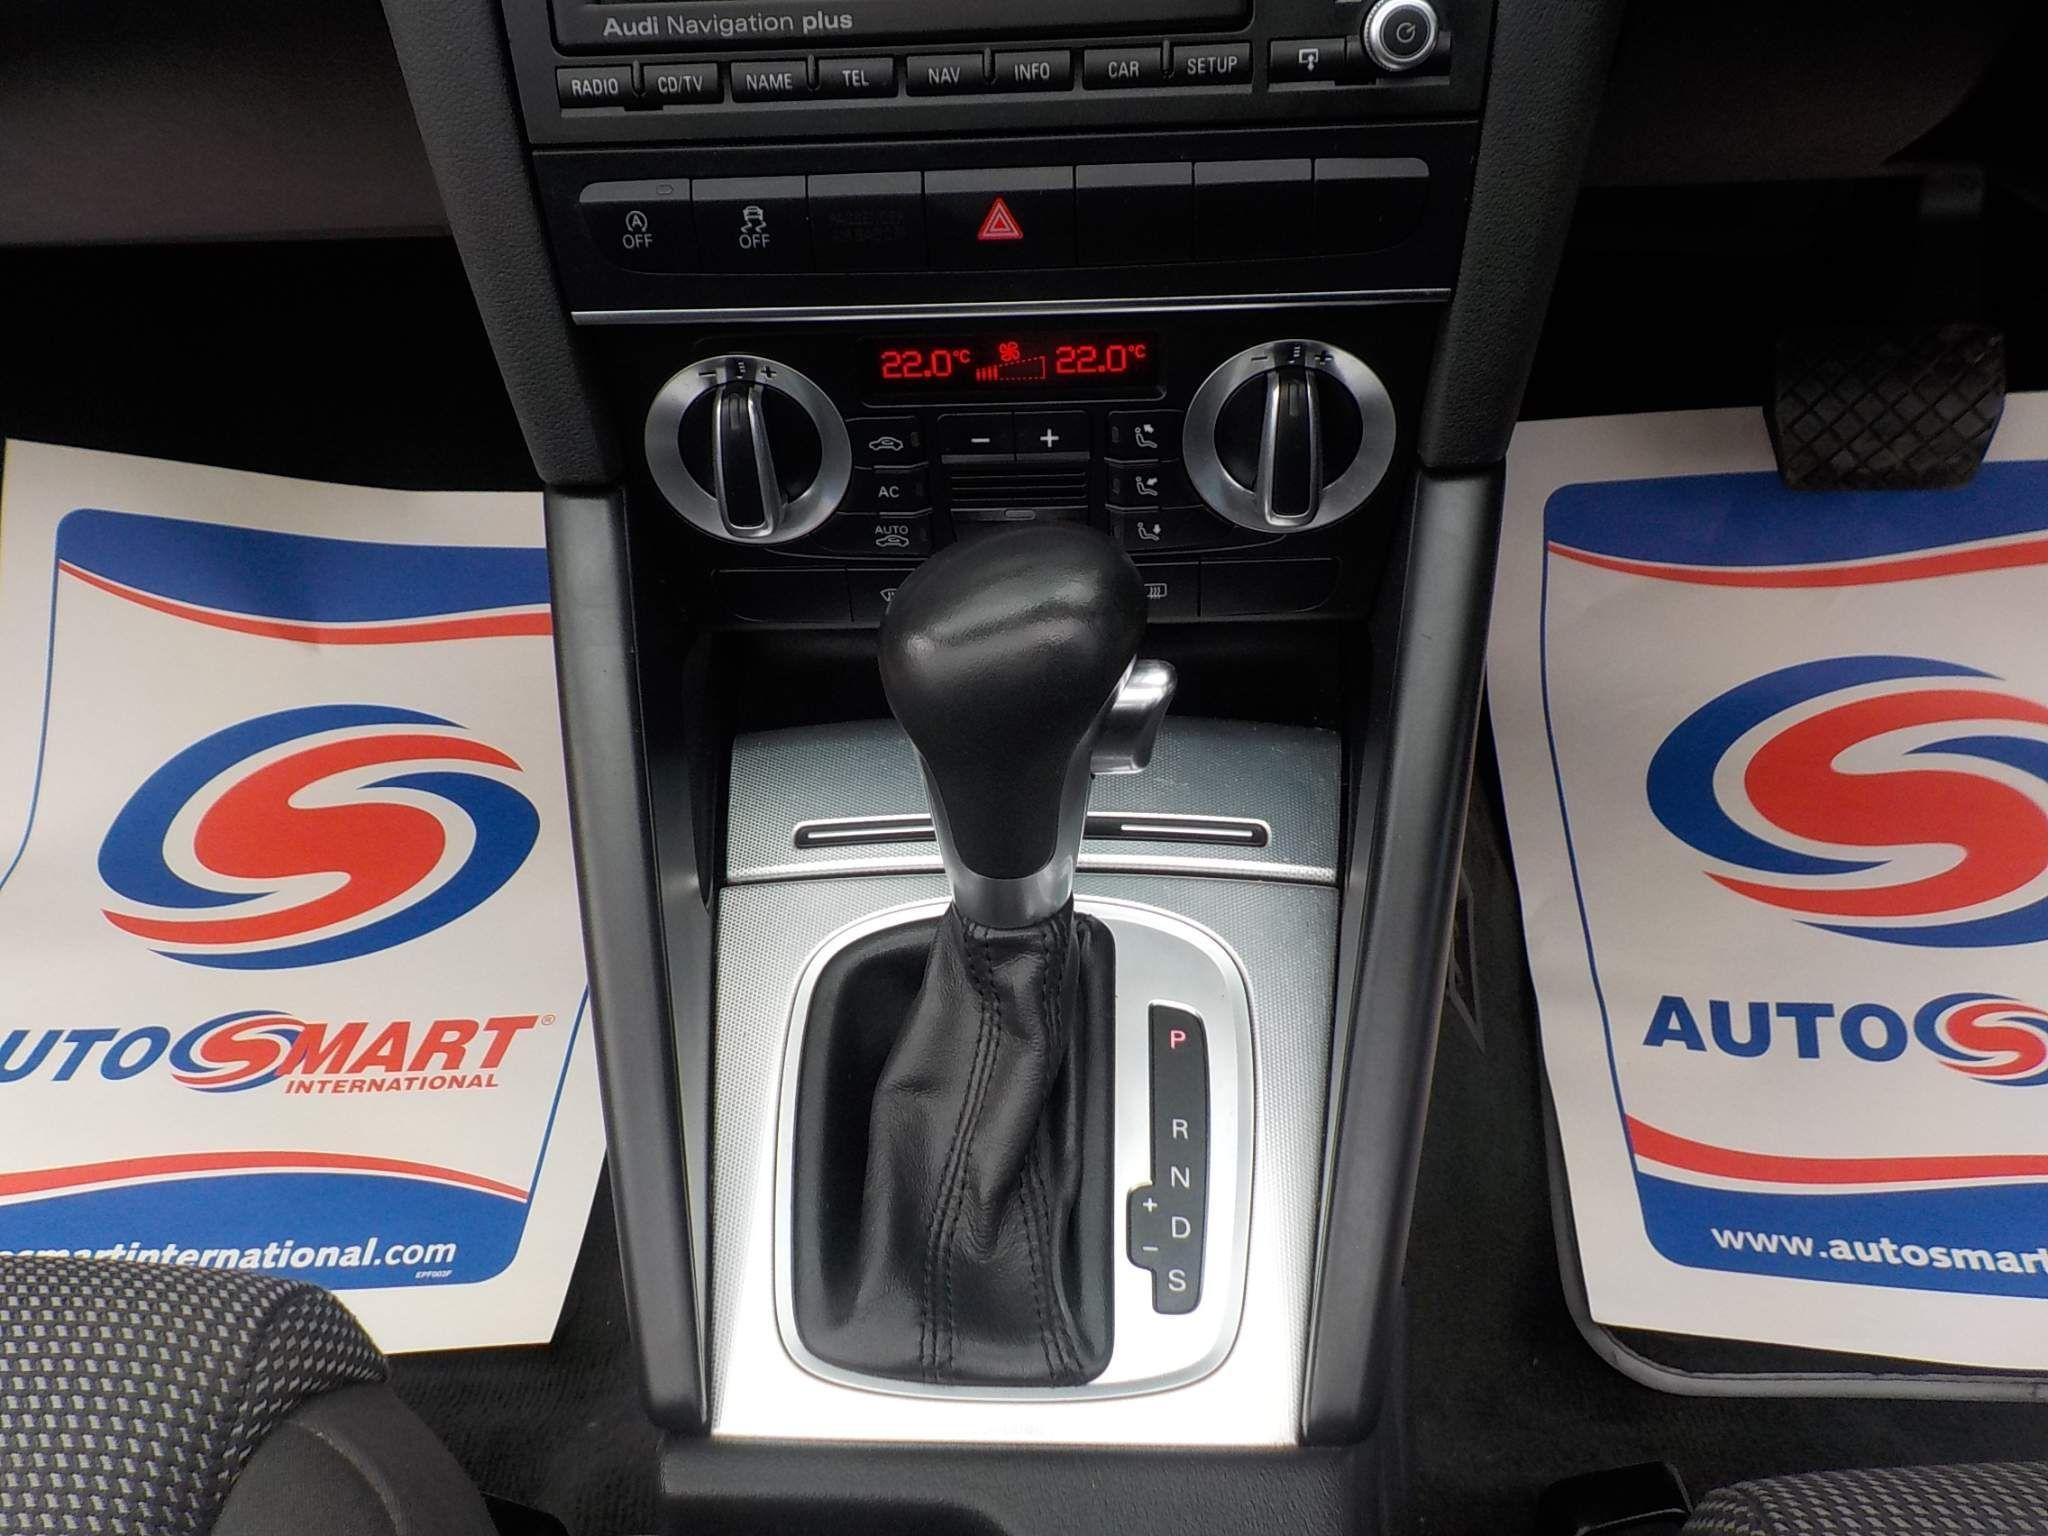 Audi A3 Cabriolet 2.0 TDI Sport S Tronic 2dr